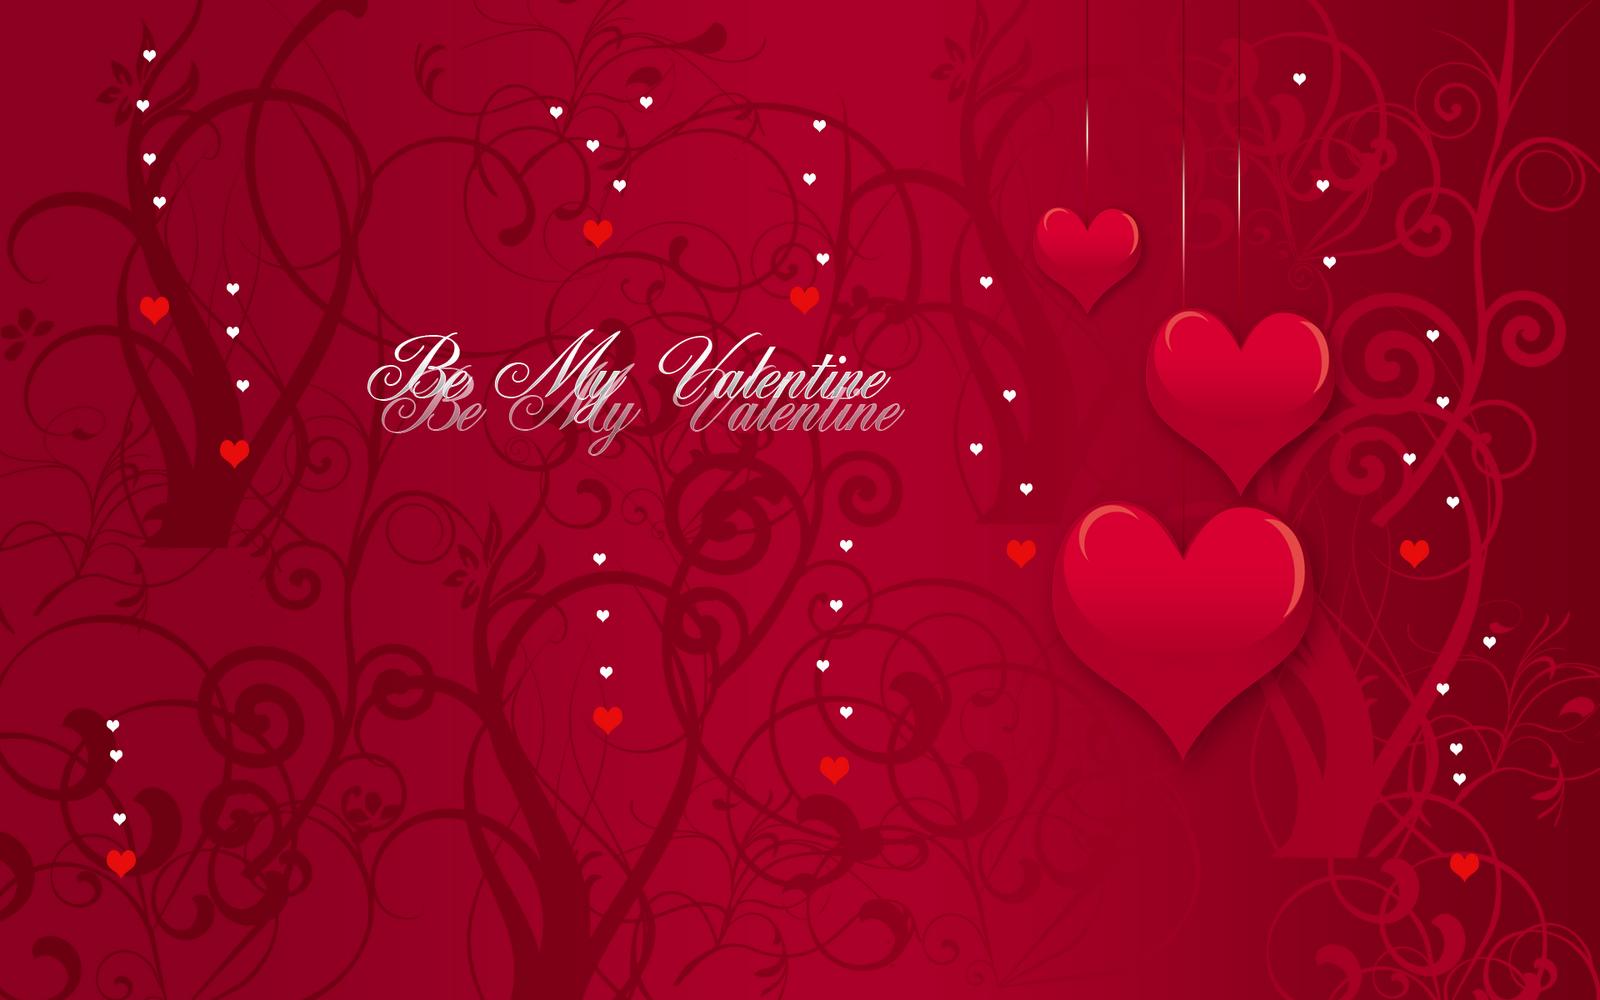 http://4.bp.blogspot.com/_nD_YgZuOadA/TVE7eA4RG0I/AAAAAAAABYA/kdMuen_TUbc/s1600/Be_My_Valentine_hd%20wallpaper.png